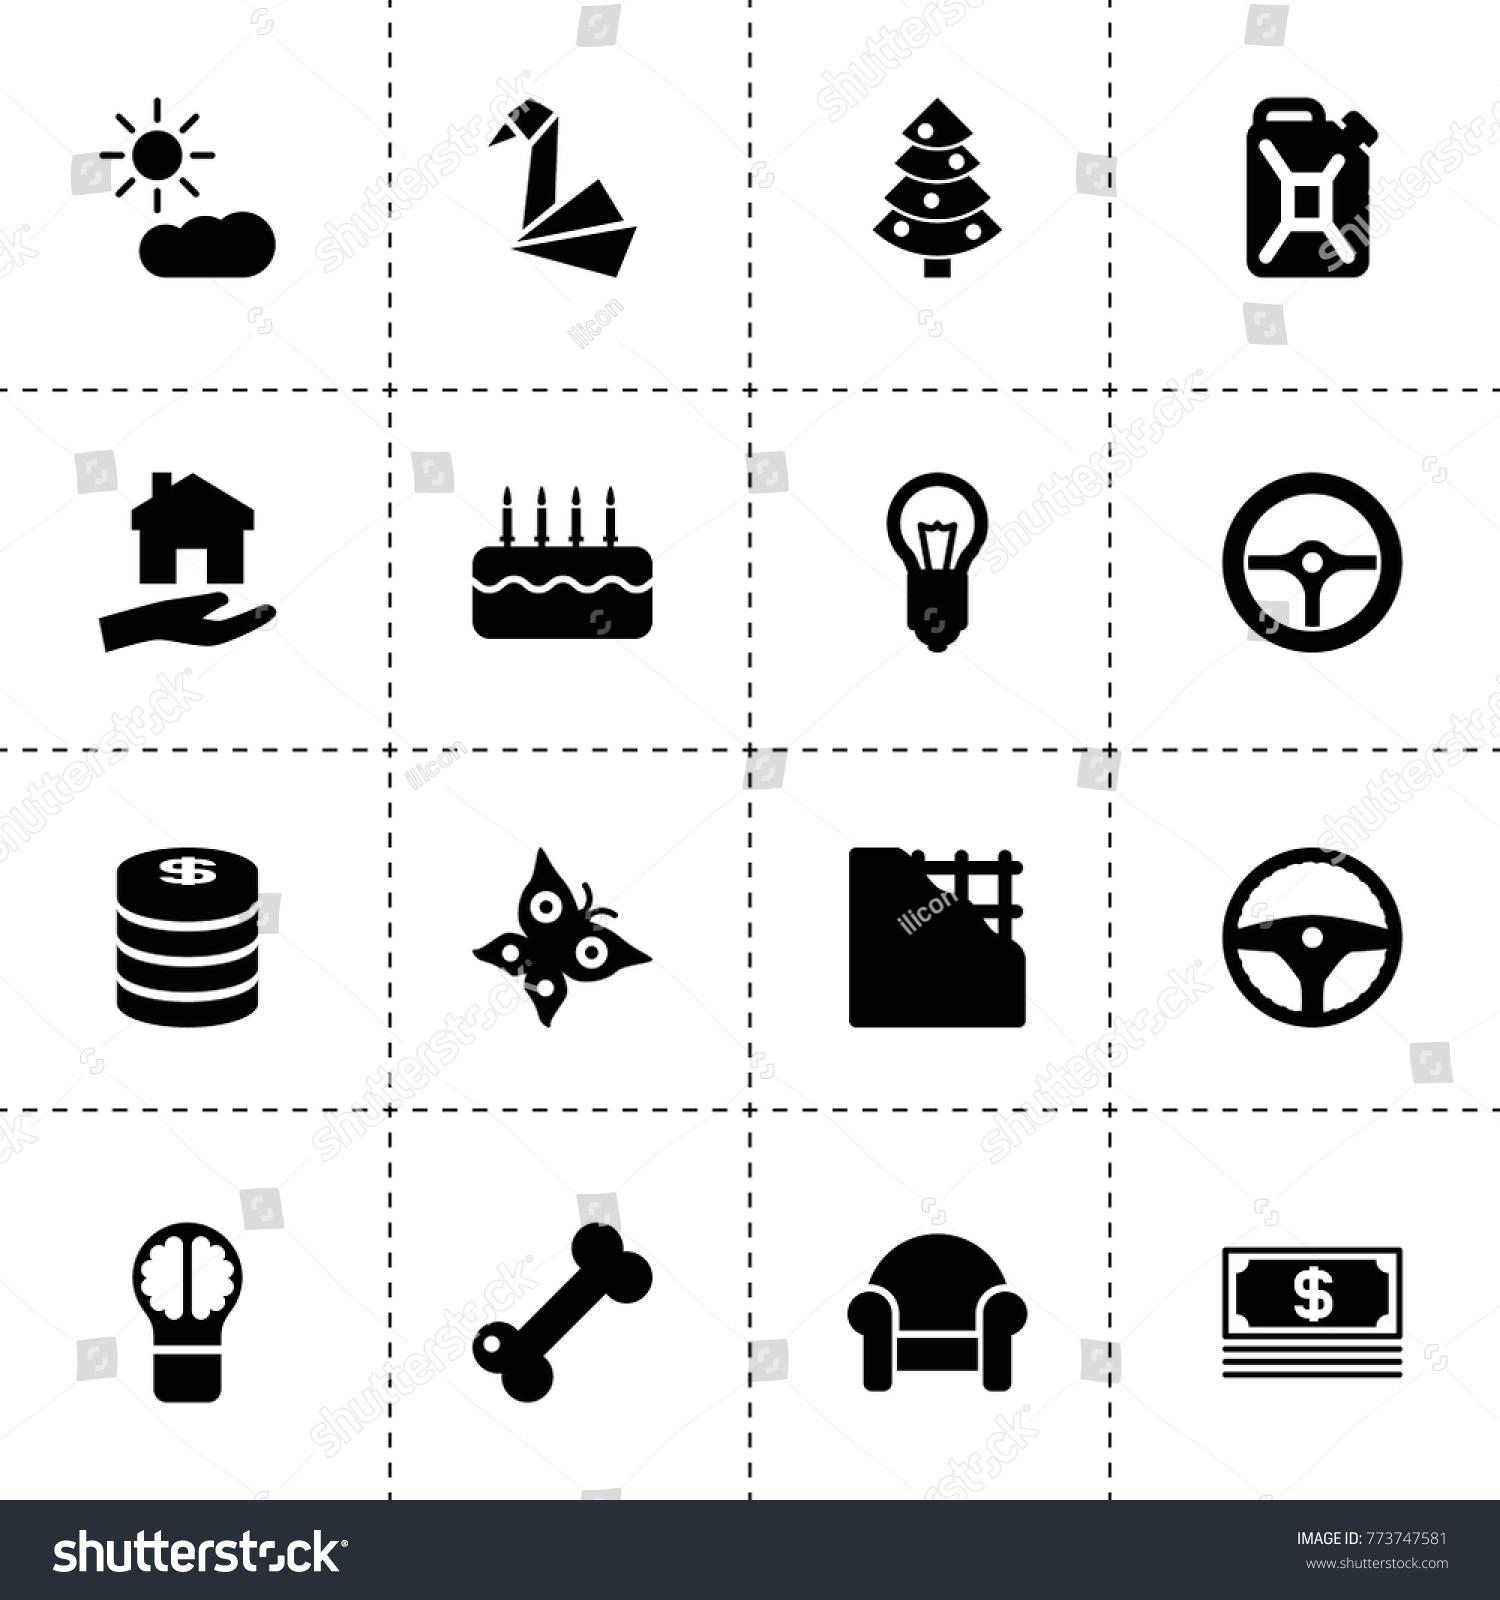 Creative icons vector collection filled creative stock vector creative icons vector collection filled creative icons includes symbols such as steering wheel buycottarizona